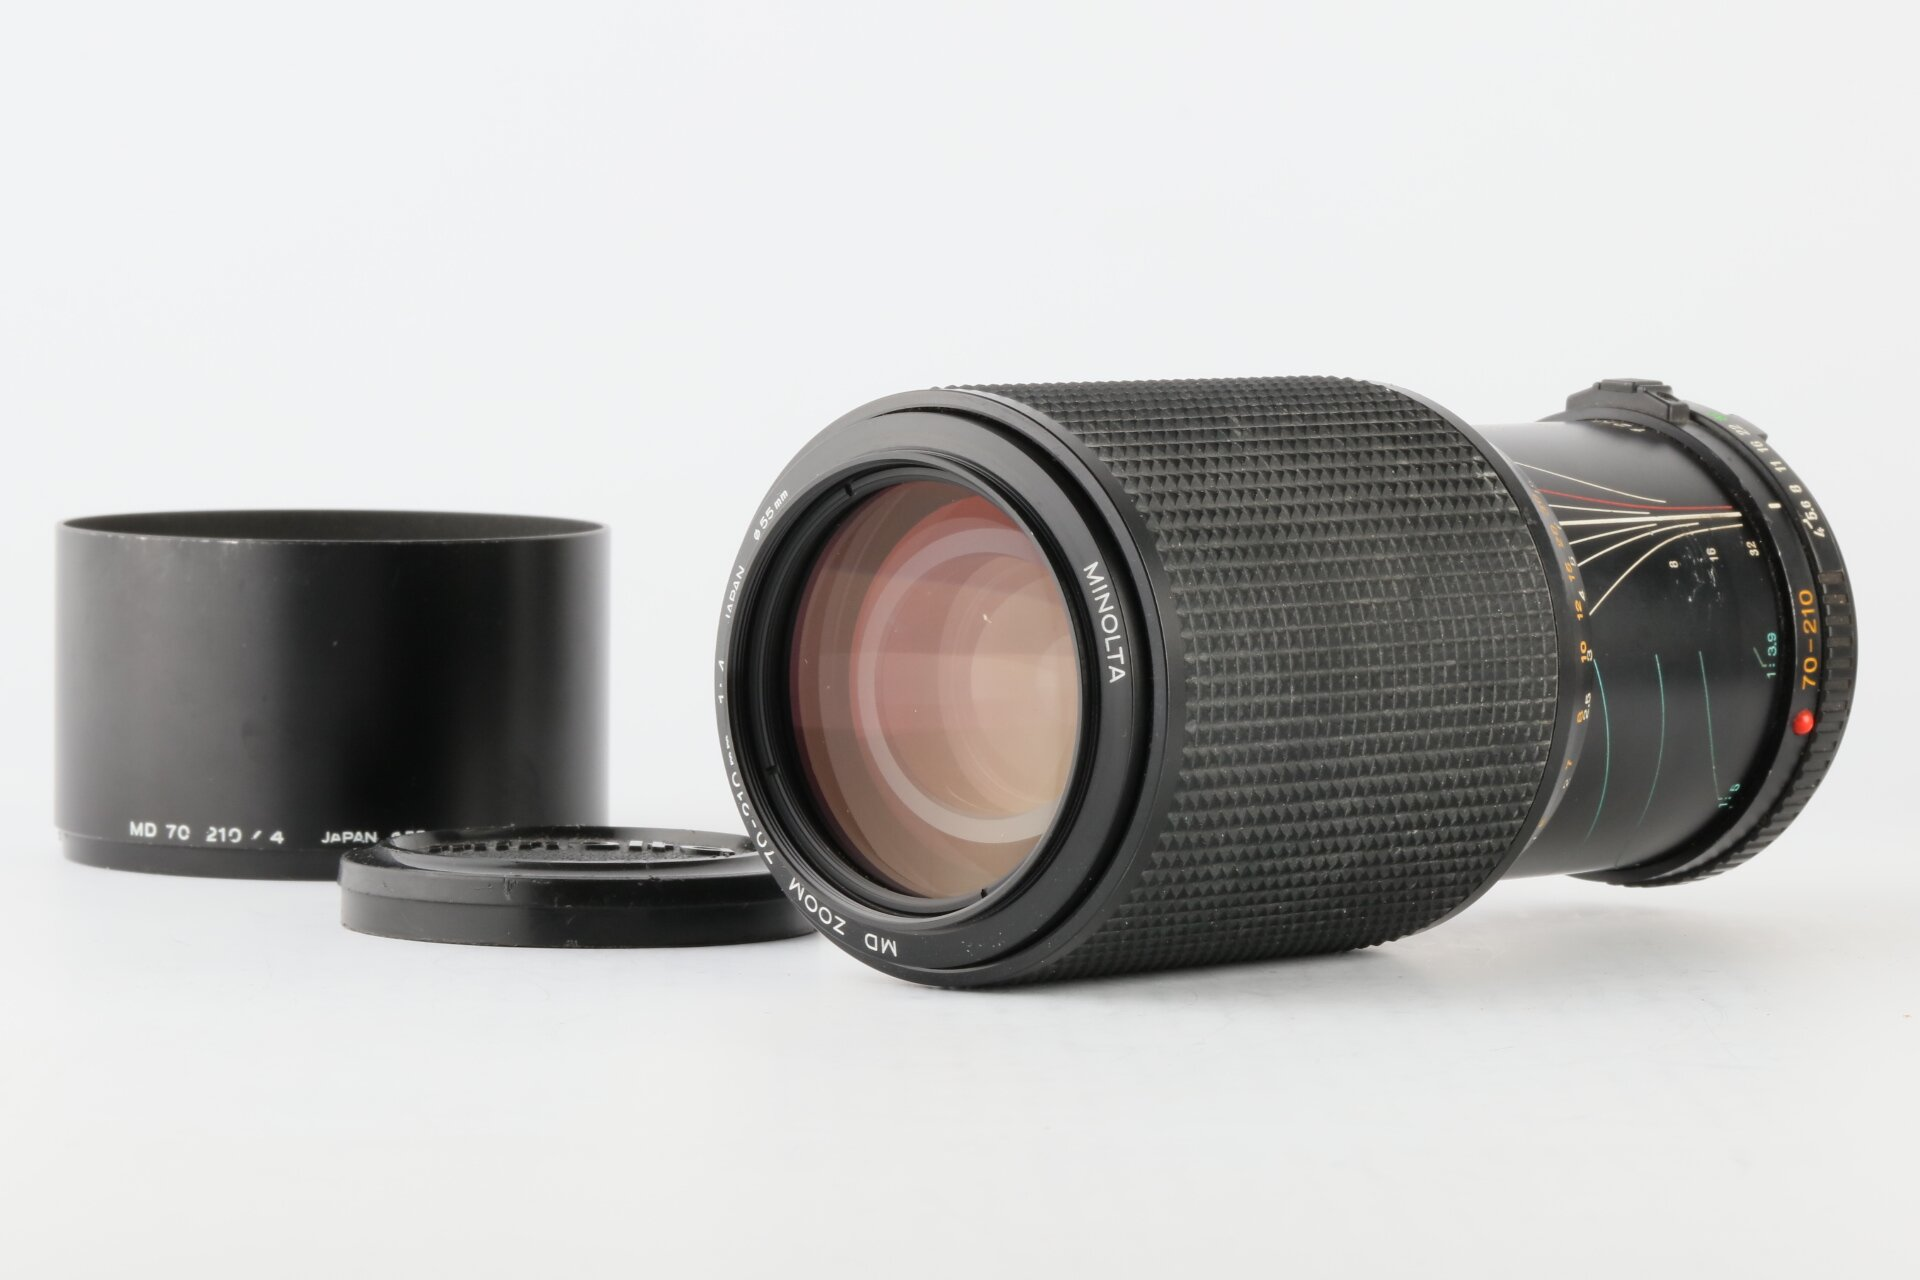 Minolta MD Zoom 70-210mm 4